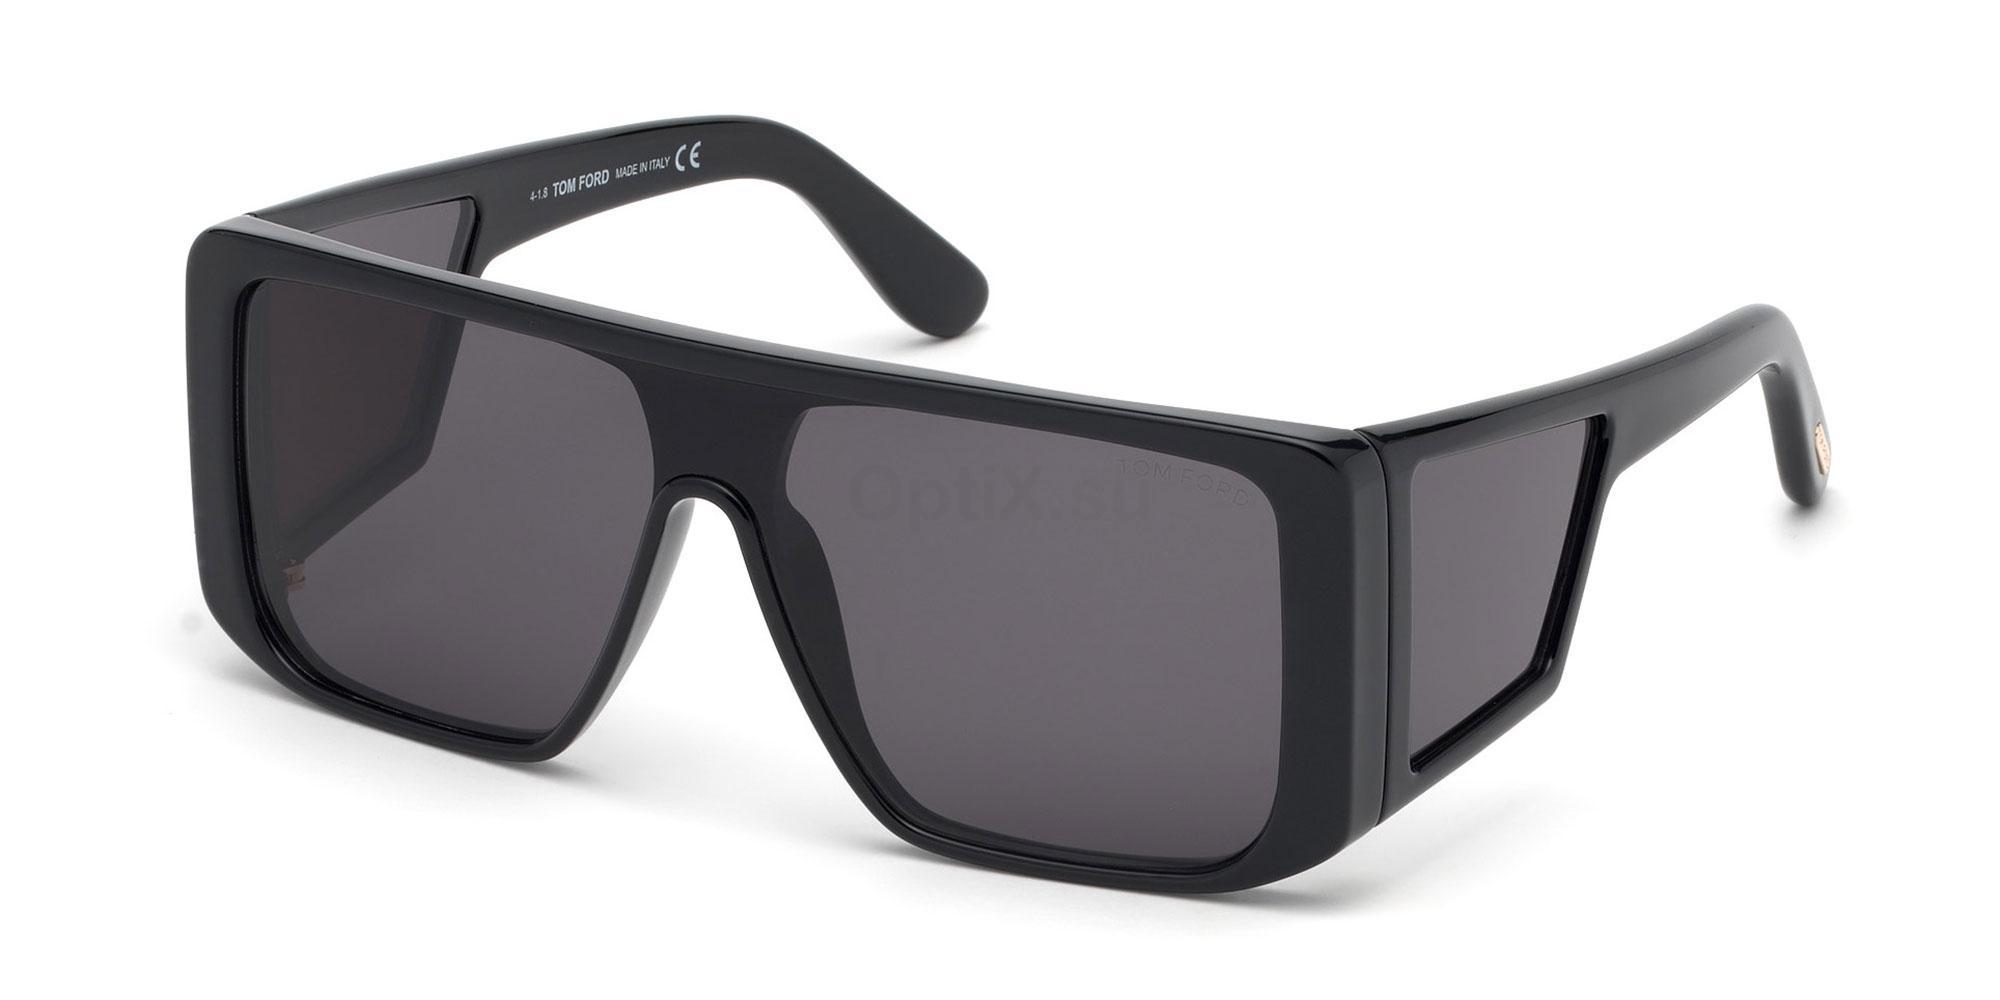 01A FT0710 Sunglasses, Tom Ford